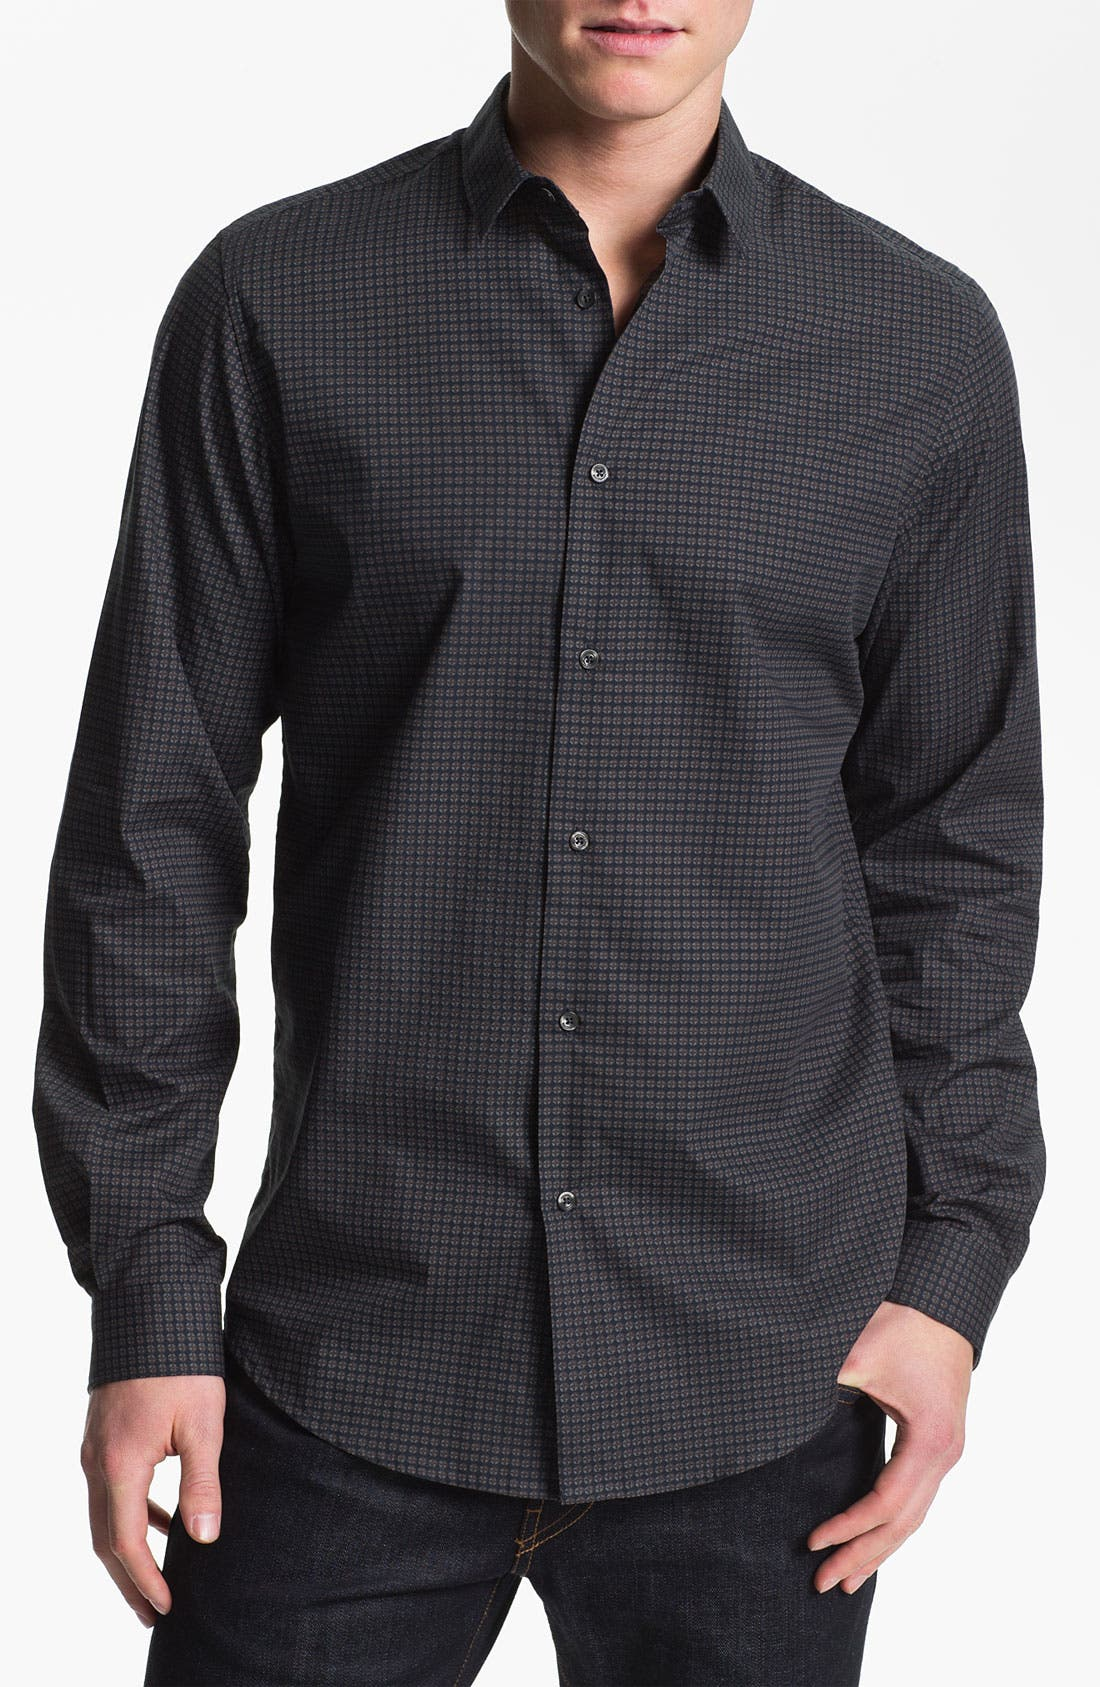 Main Image - Ben Sherman 'Kensington' Woven Shirt